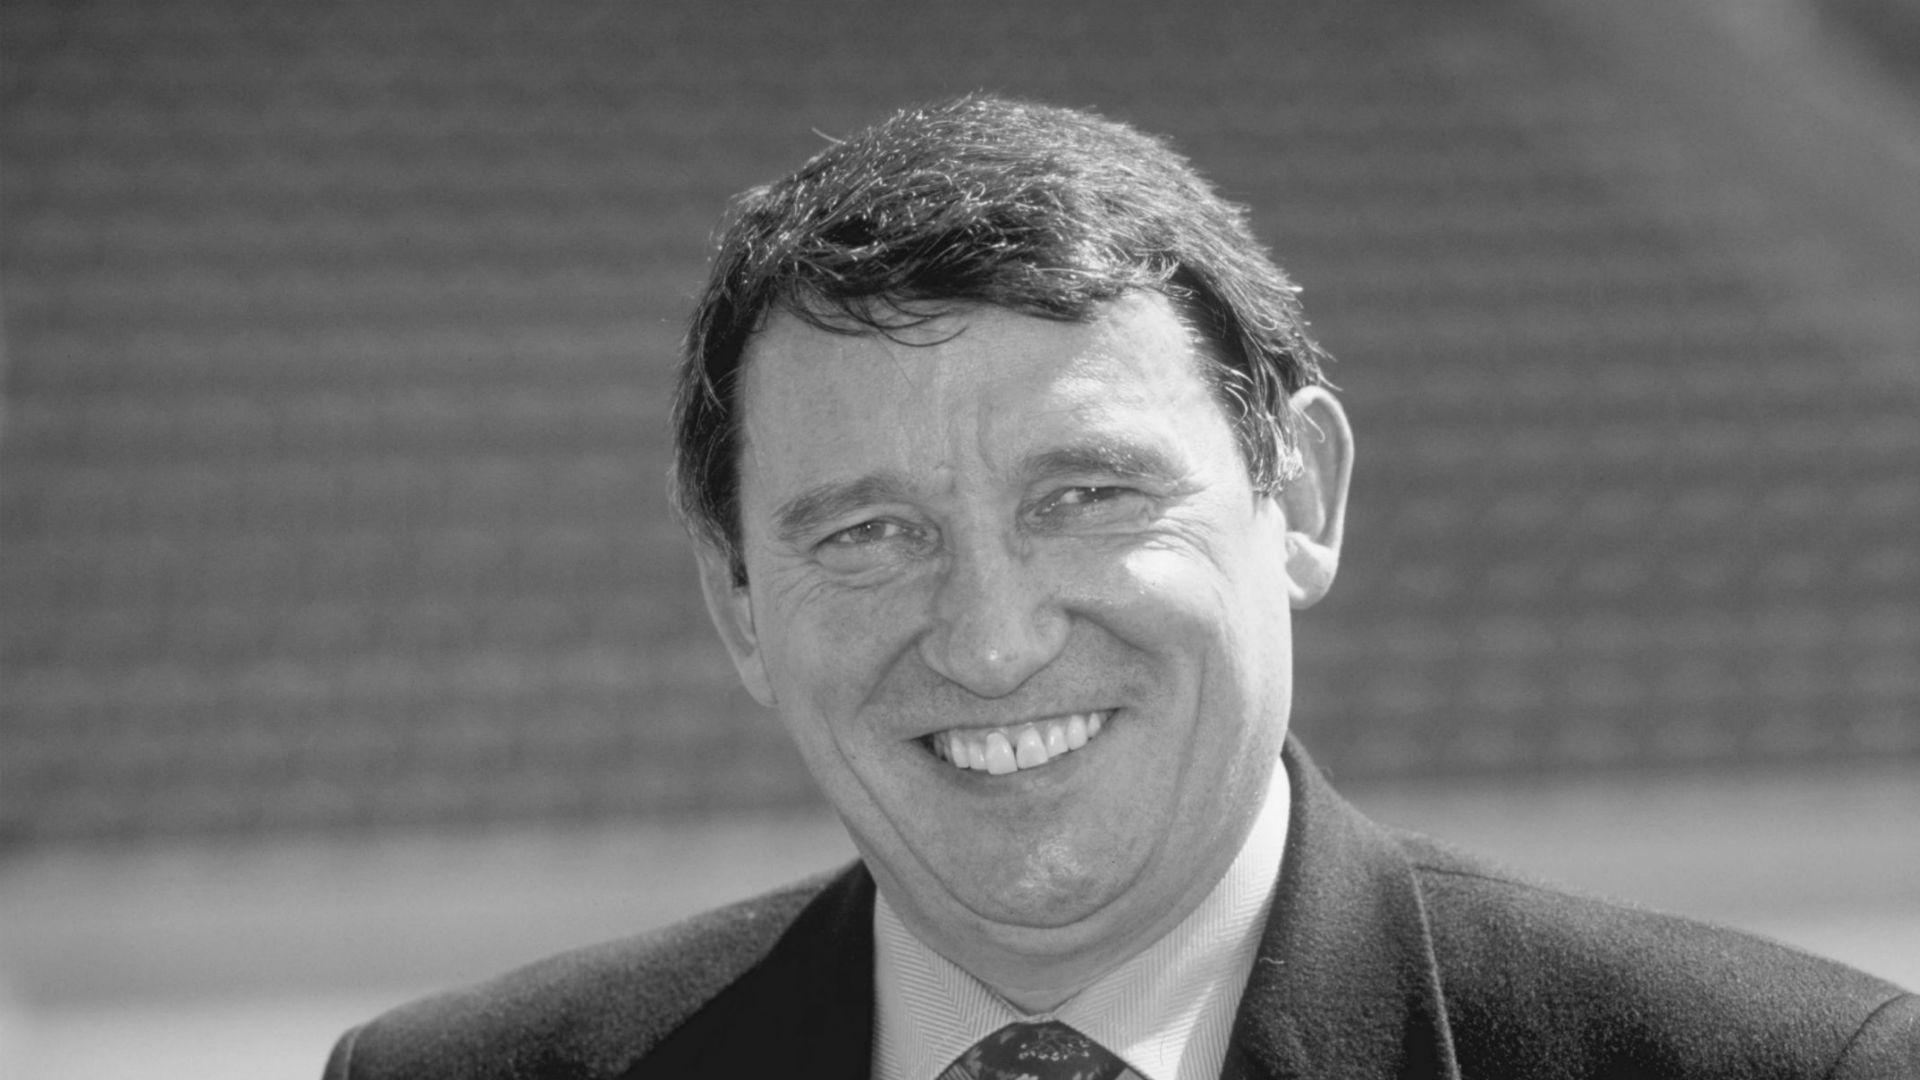 Former England manager Graham Taylor dies